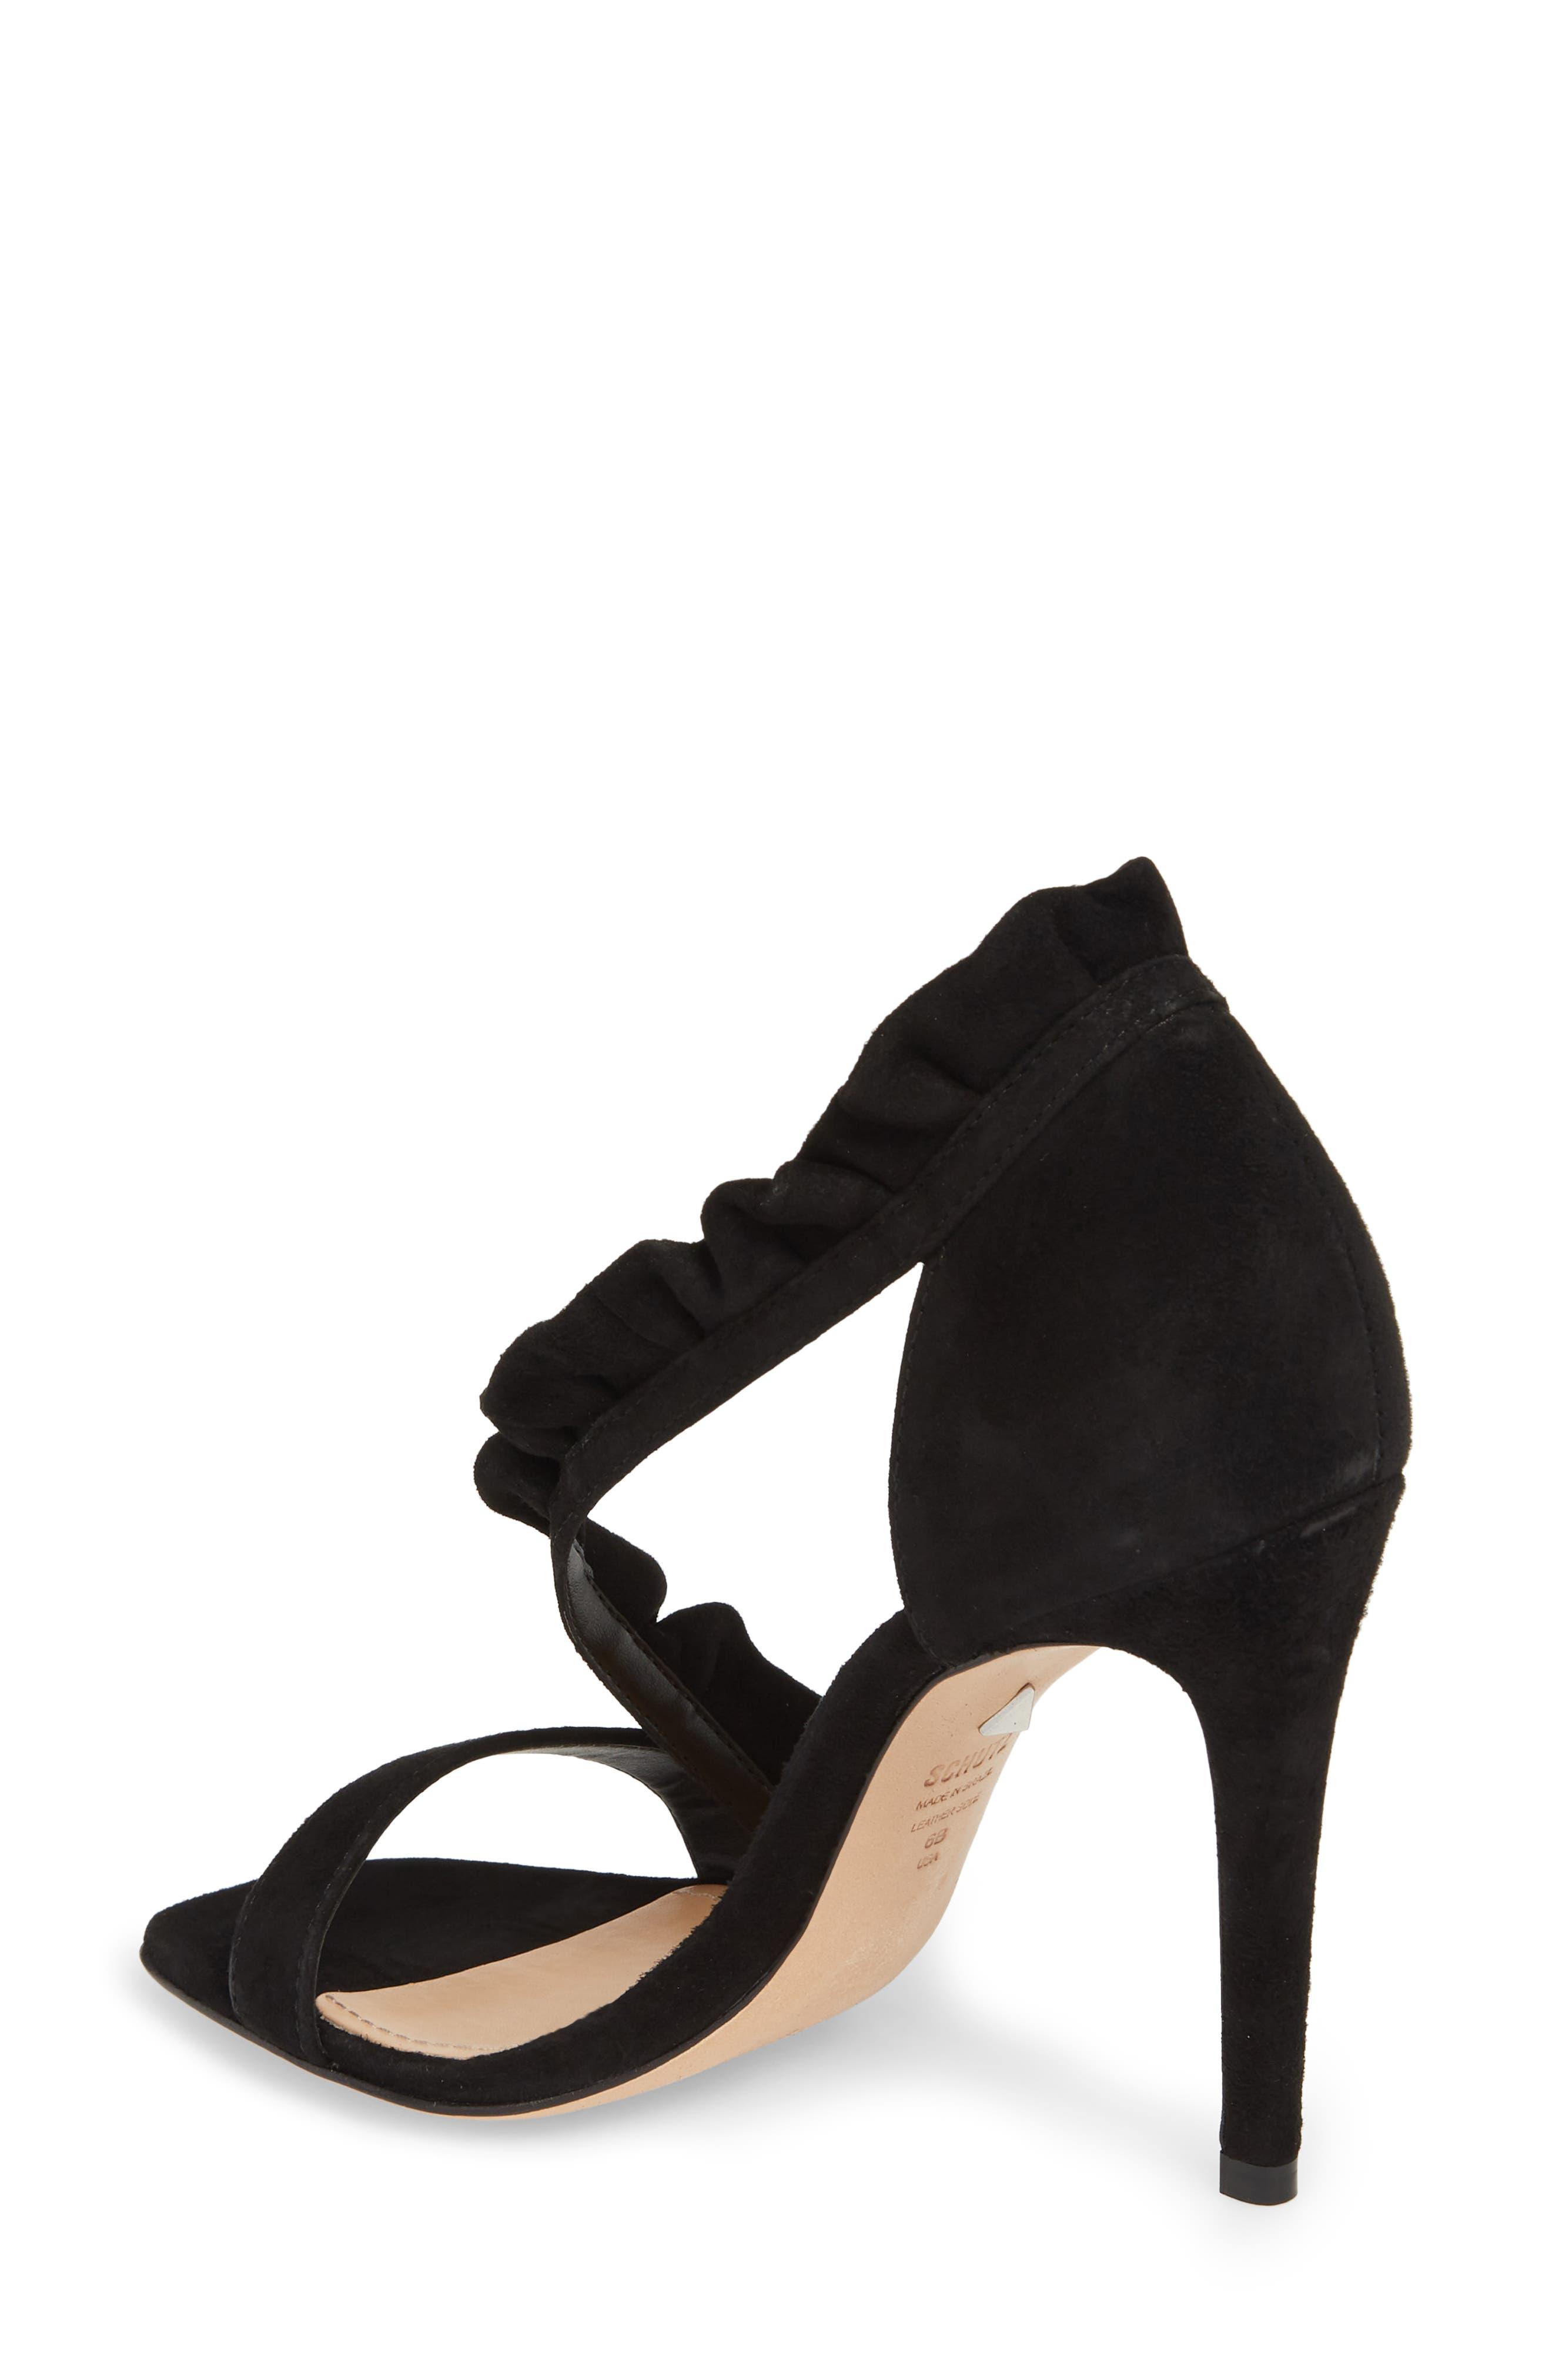 Aim Ruffle Sandal,                             Alternate thumbnail 2, color,                             BLACK SUEDE